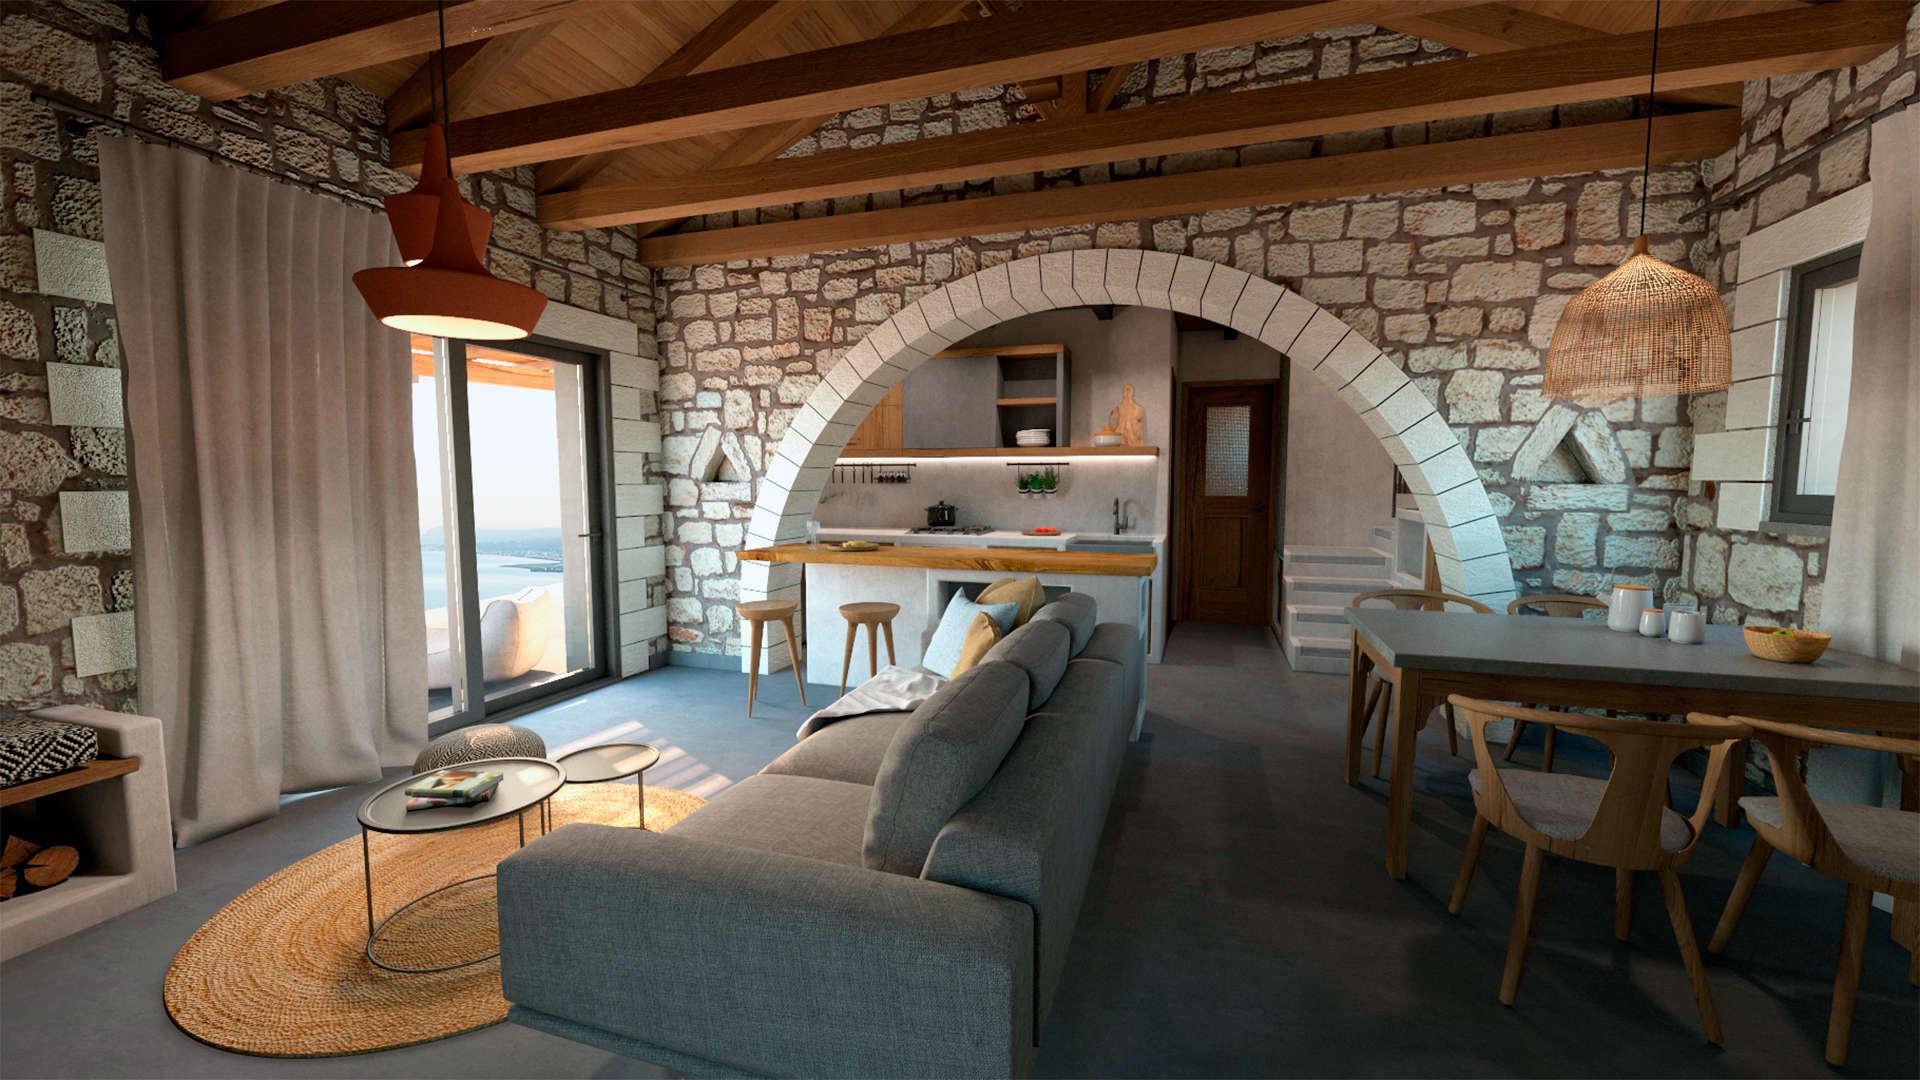 Holiday home, interior design, living room, kitchen, dining. Παραθεριστική κατοικία, εσωτερικοί χώροι, καθιστικό, τραπεζαρία, κουζίνα.